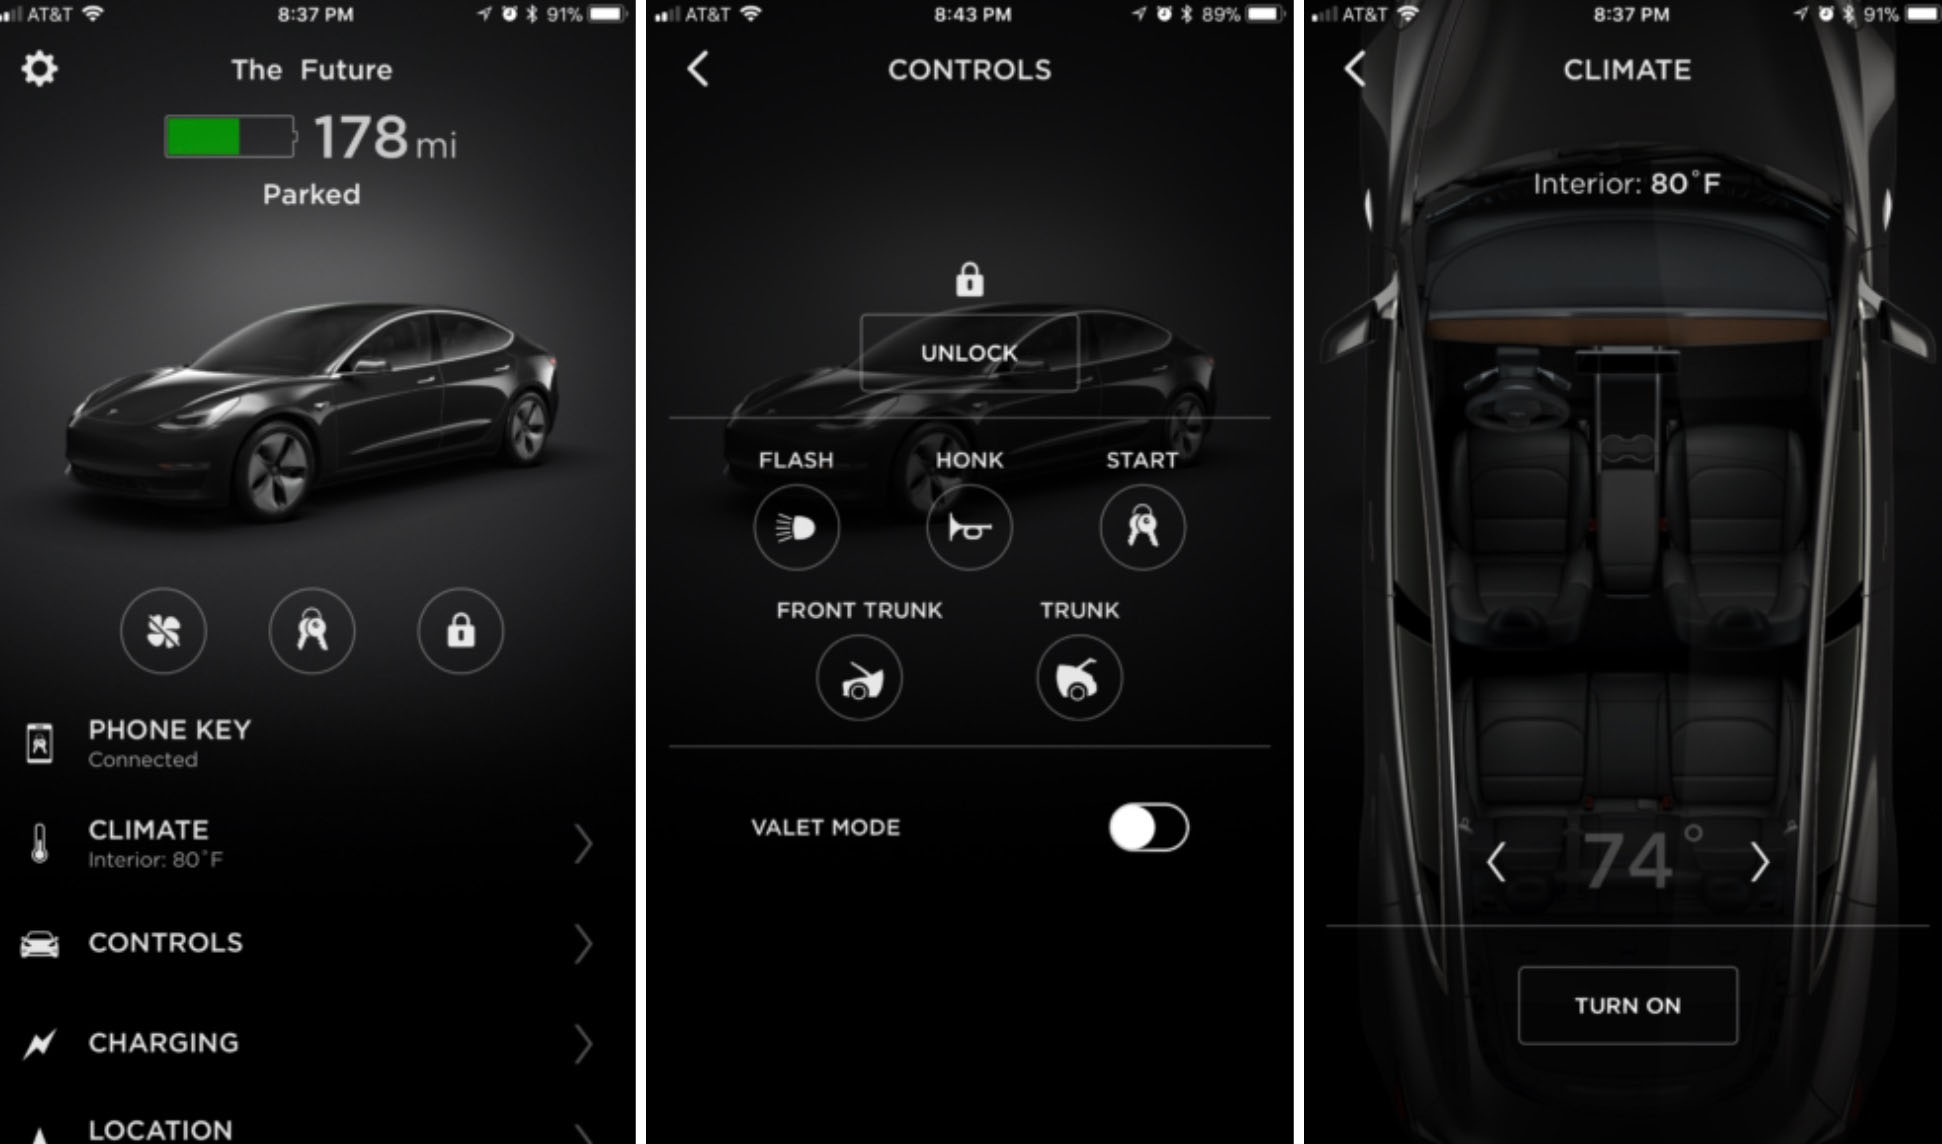 Tesla's Mobile App. Photo source: Teslarati.